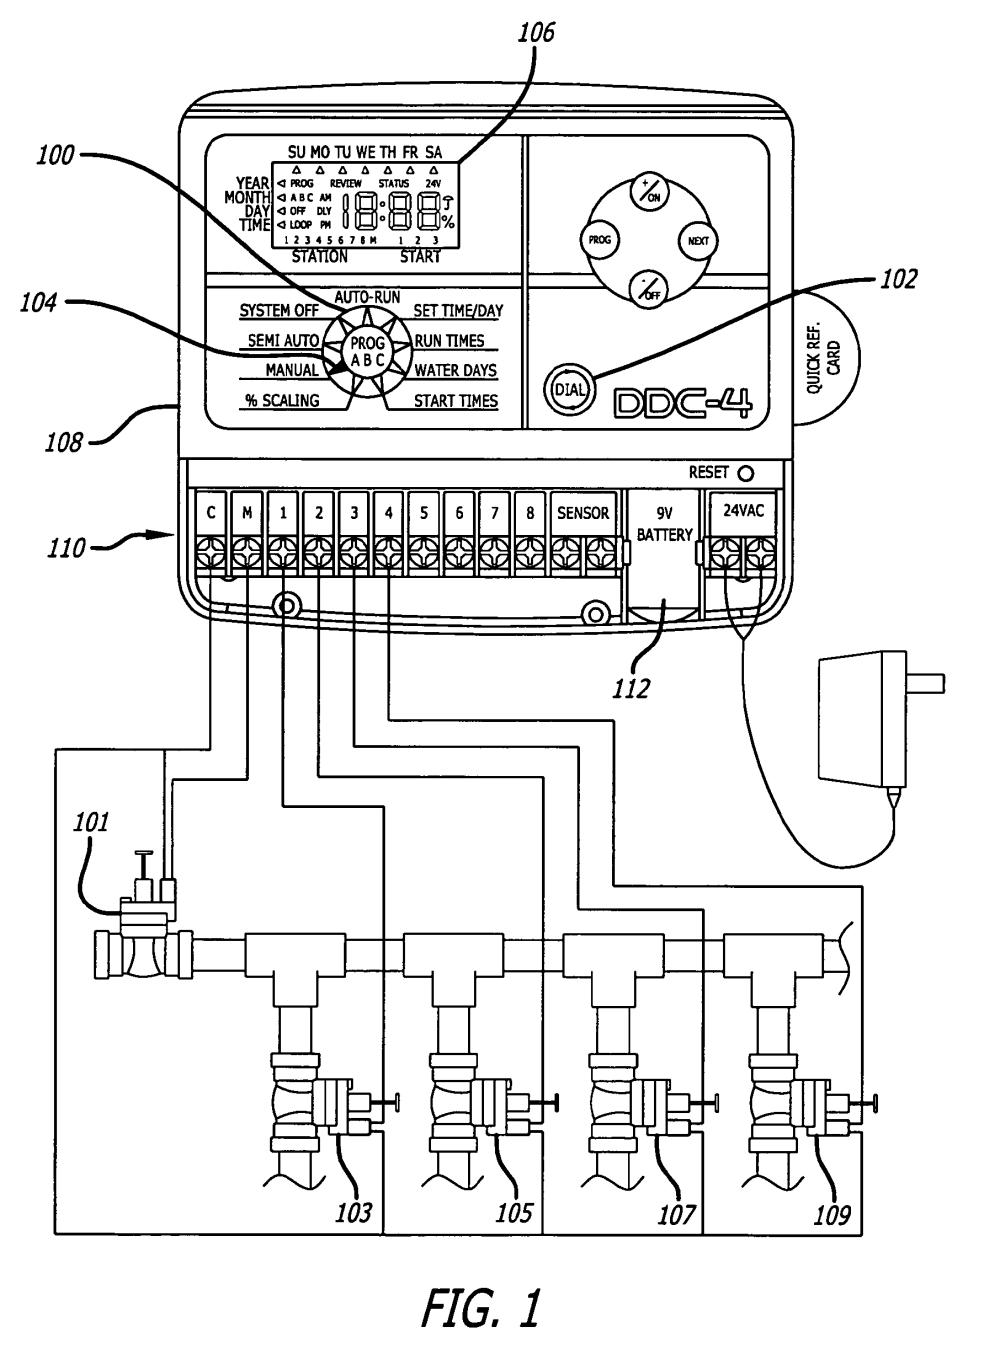 medium resolution of toro sprinkler wiring diagram 29 wiring diagram images orbit sprinkler system wiring diagram sprinkler pump wiring diagram